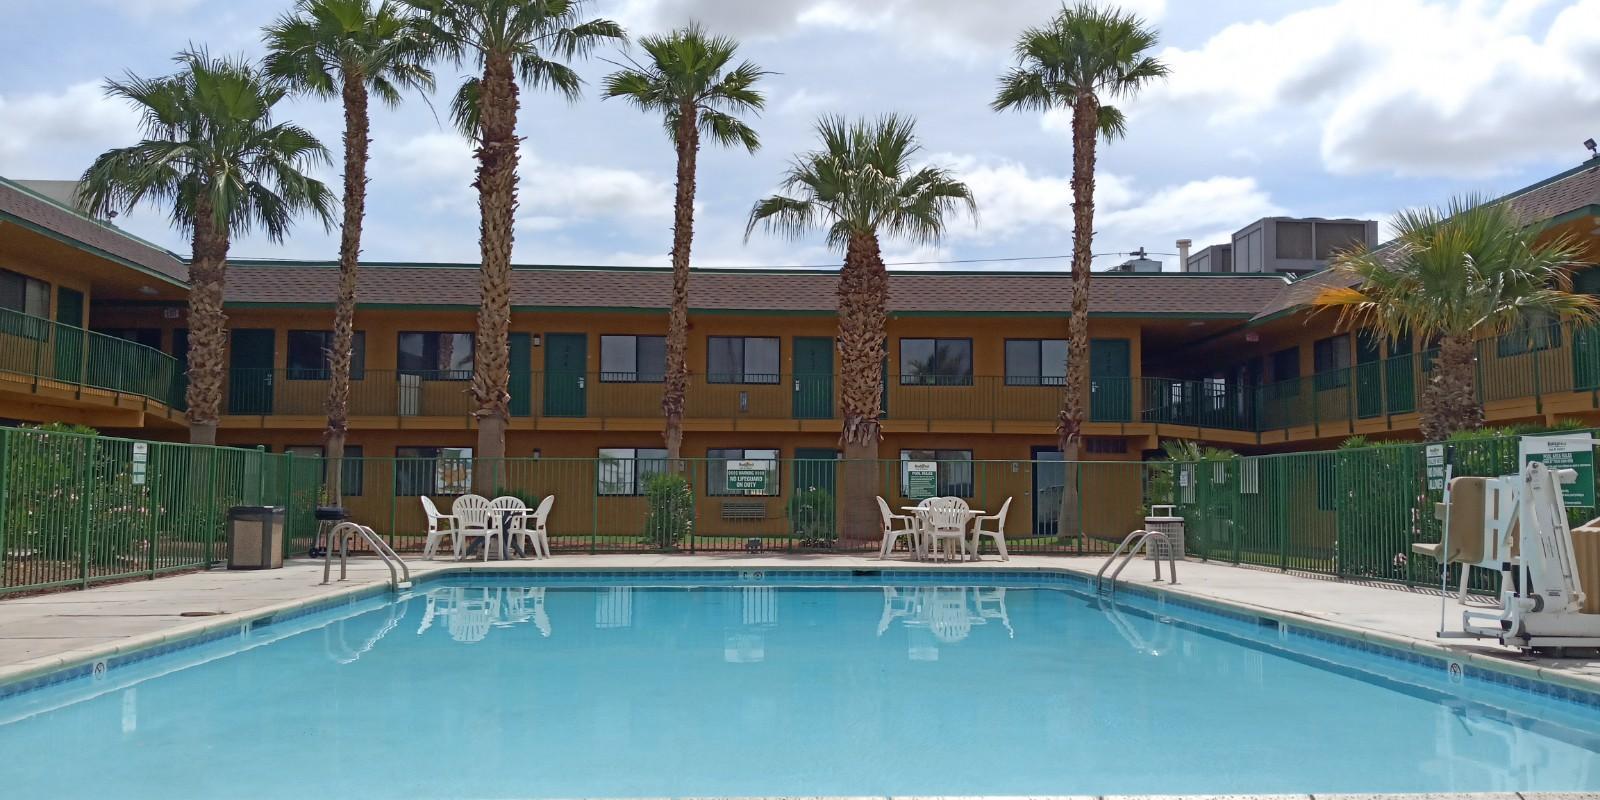 Budgetel Inn & Suites Yuma, Yuma